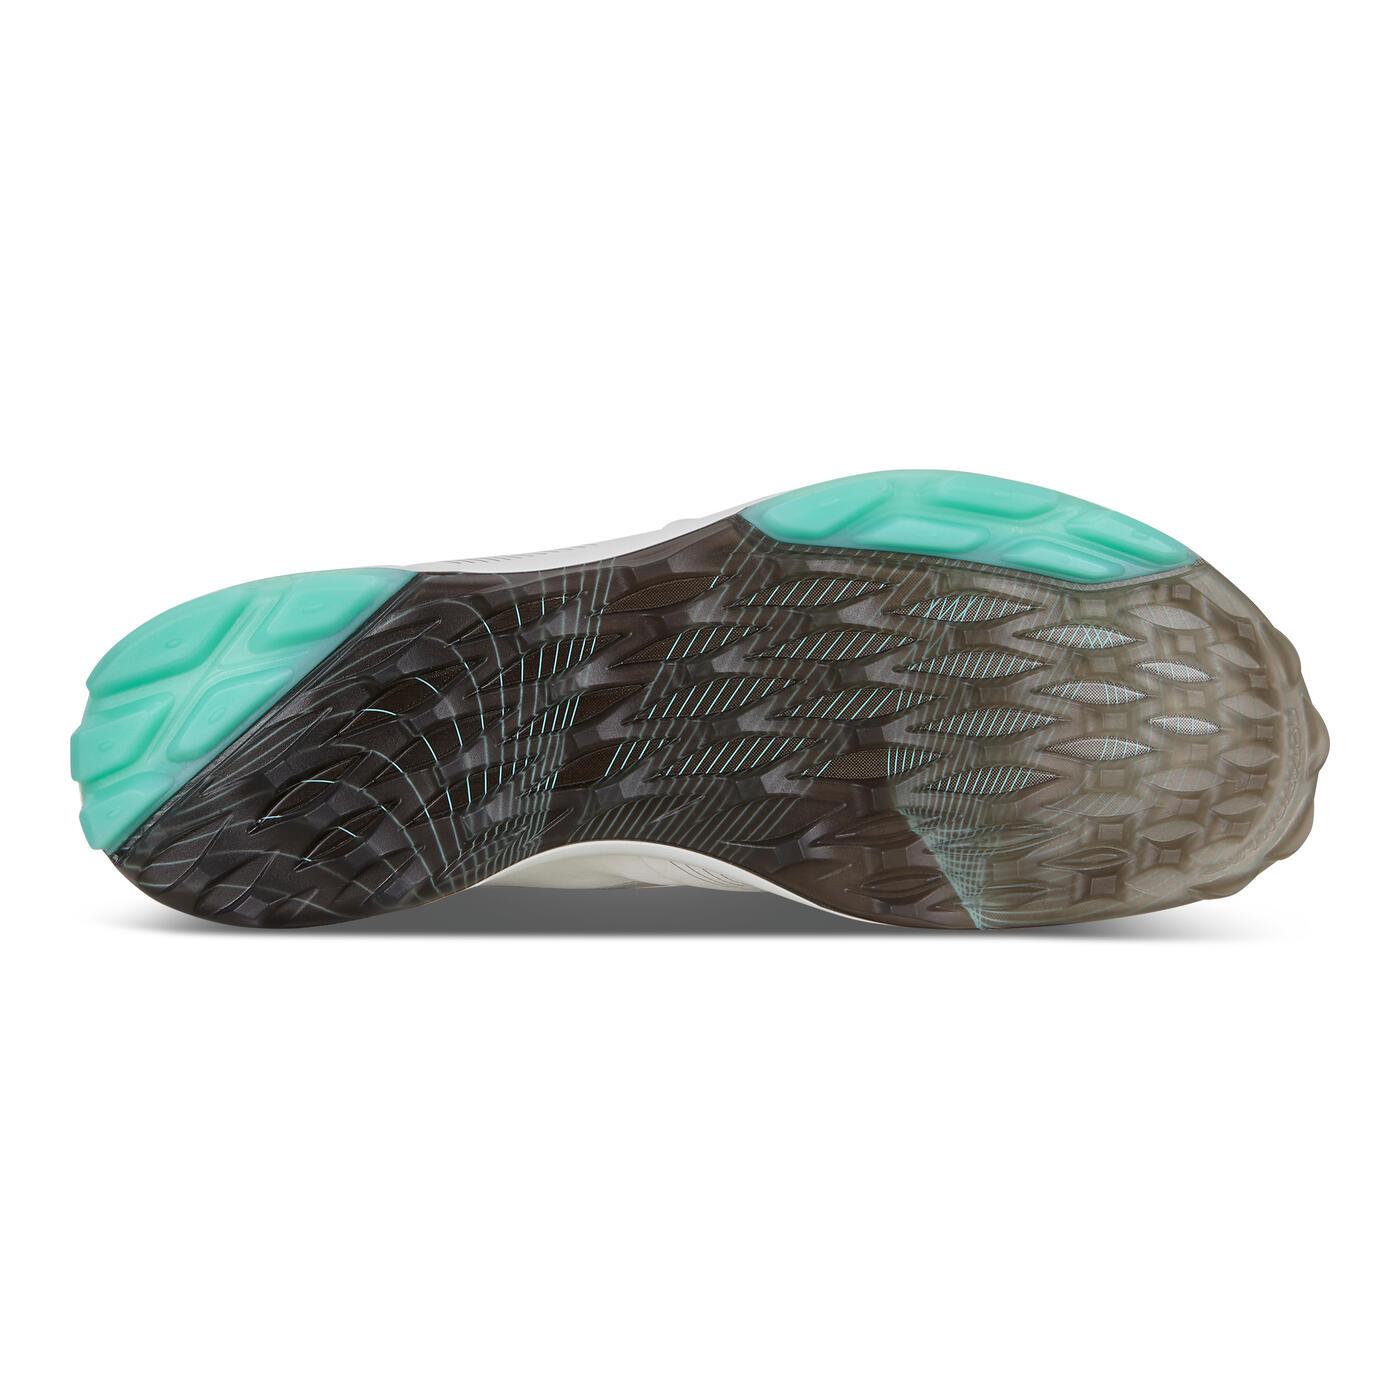 ECCO BIOM HYBRID 3 GTX BOA Women's Shoe